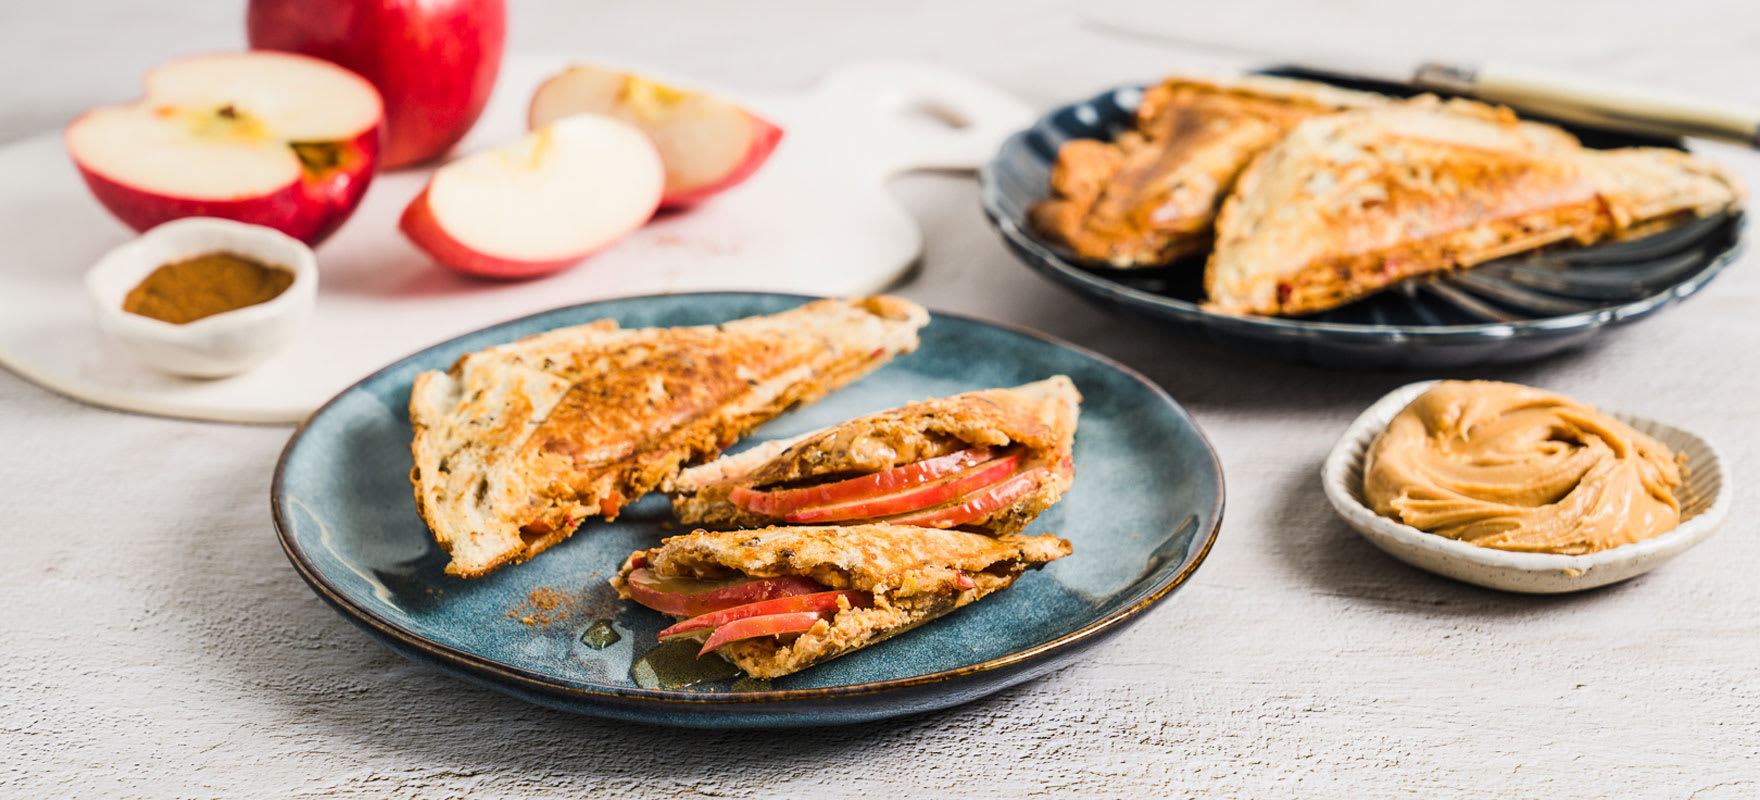 Peanut butter & apple toasted sandwich image 1